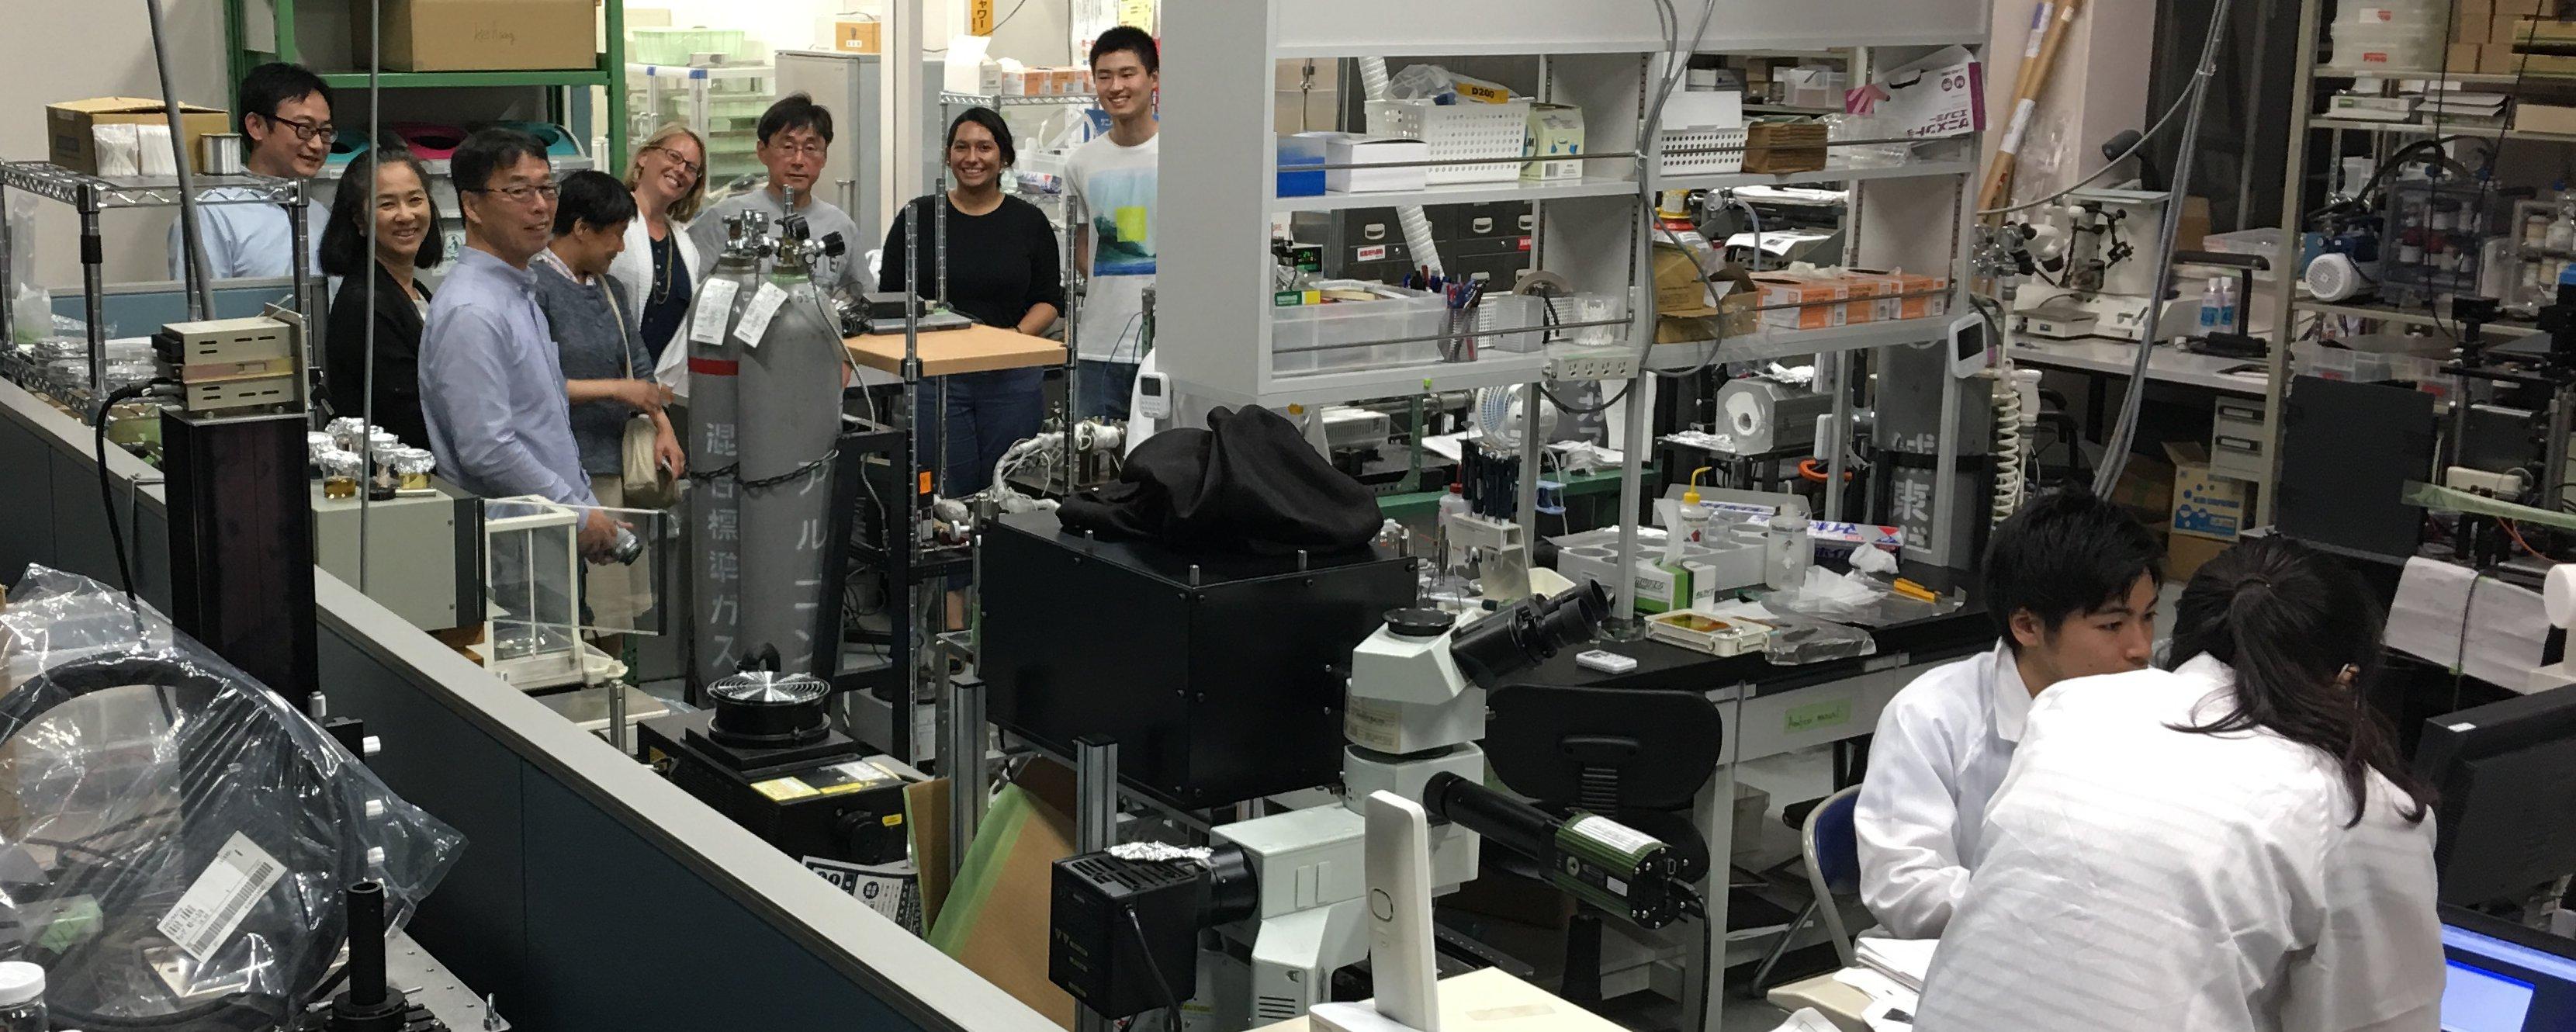 david mermin quantum computer science pdf